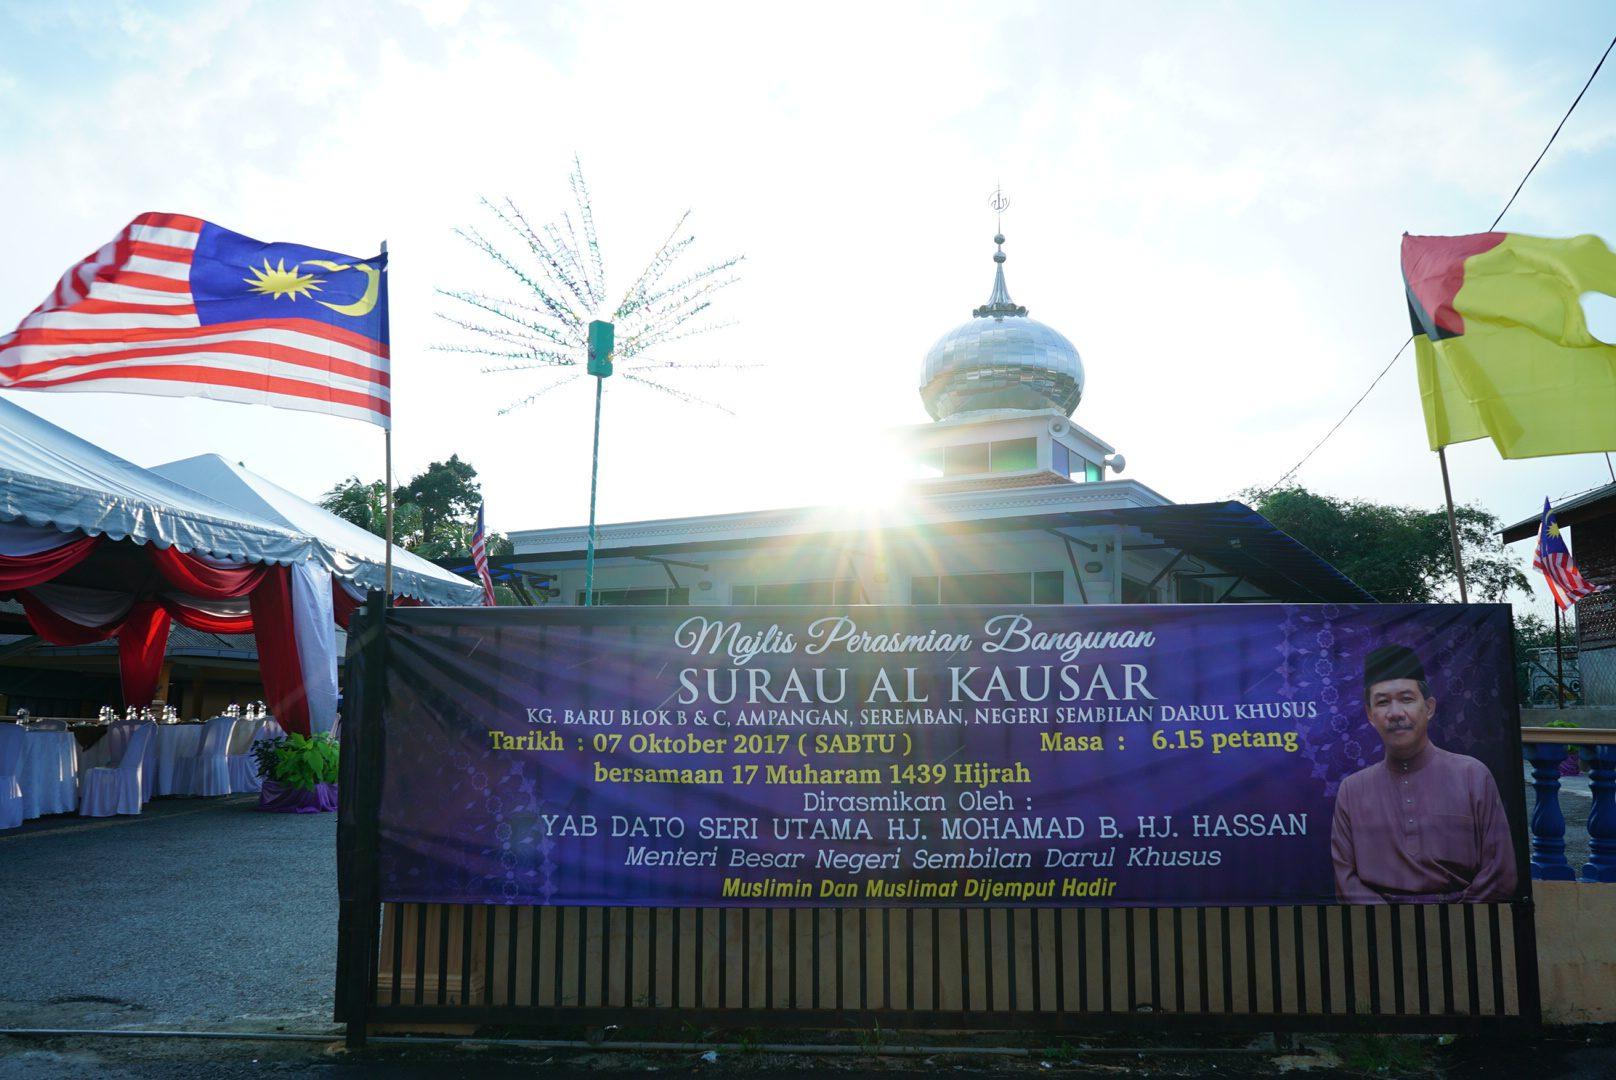 Perasmian Surau Al-Kausar